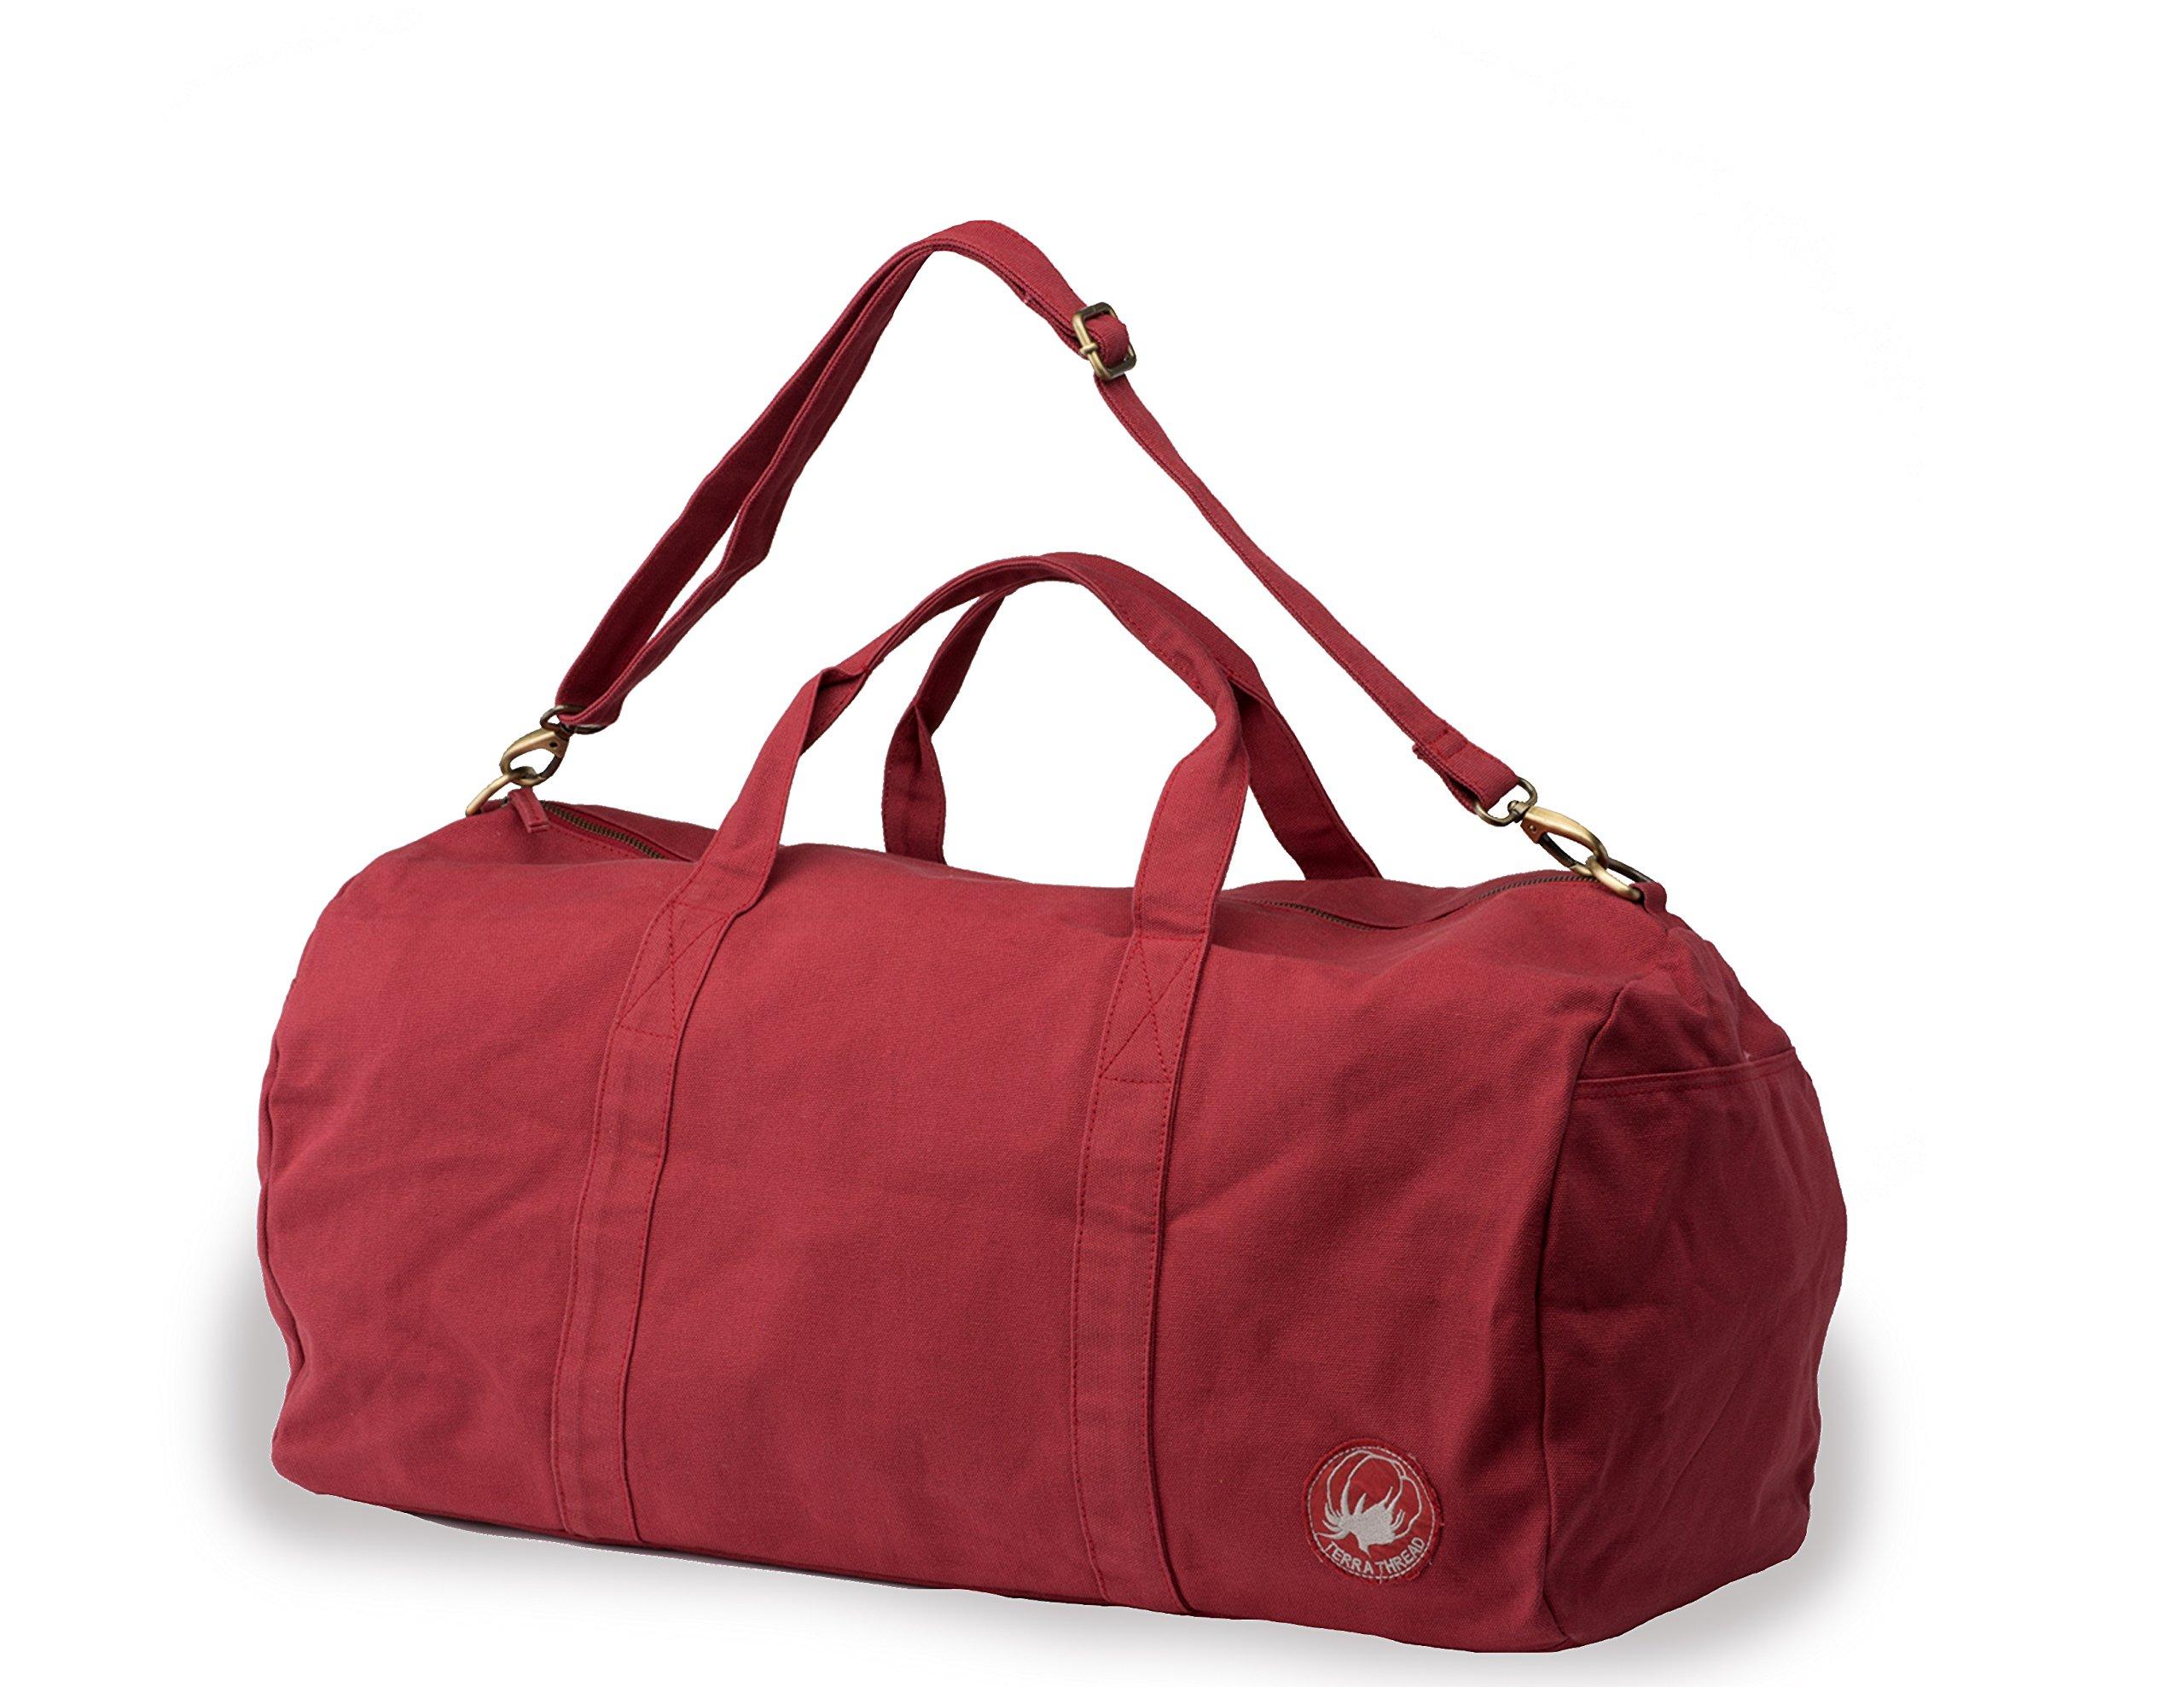 GOTS Certified. Canvas Duffel Bag. Fair trade travel bags for men and women.